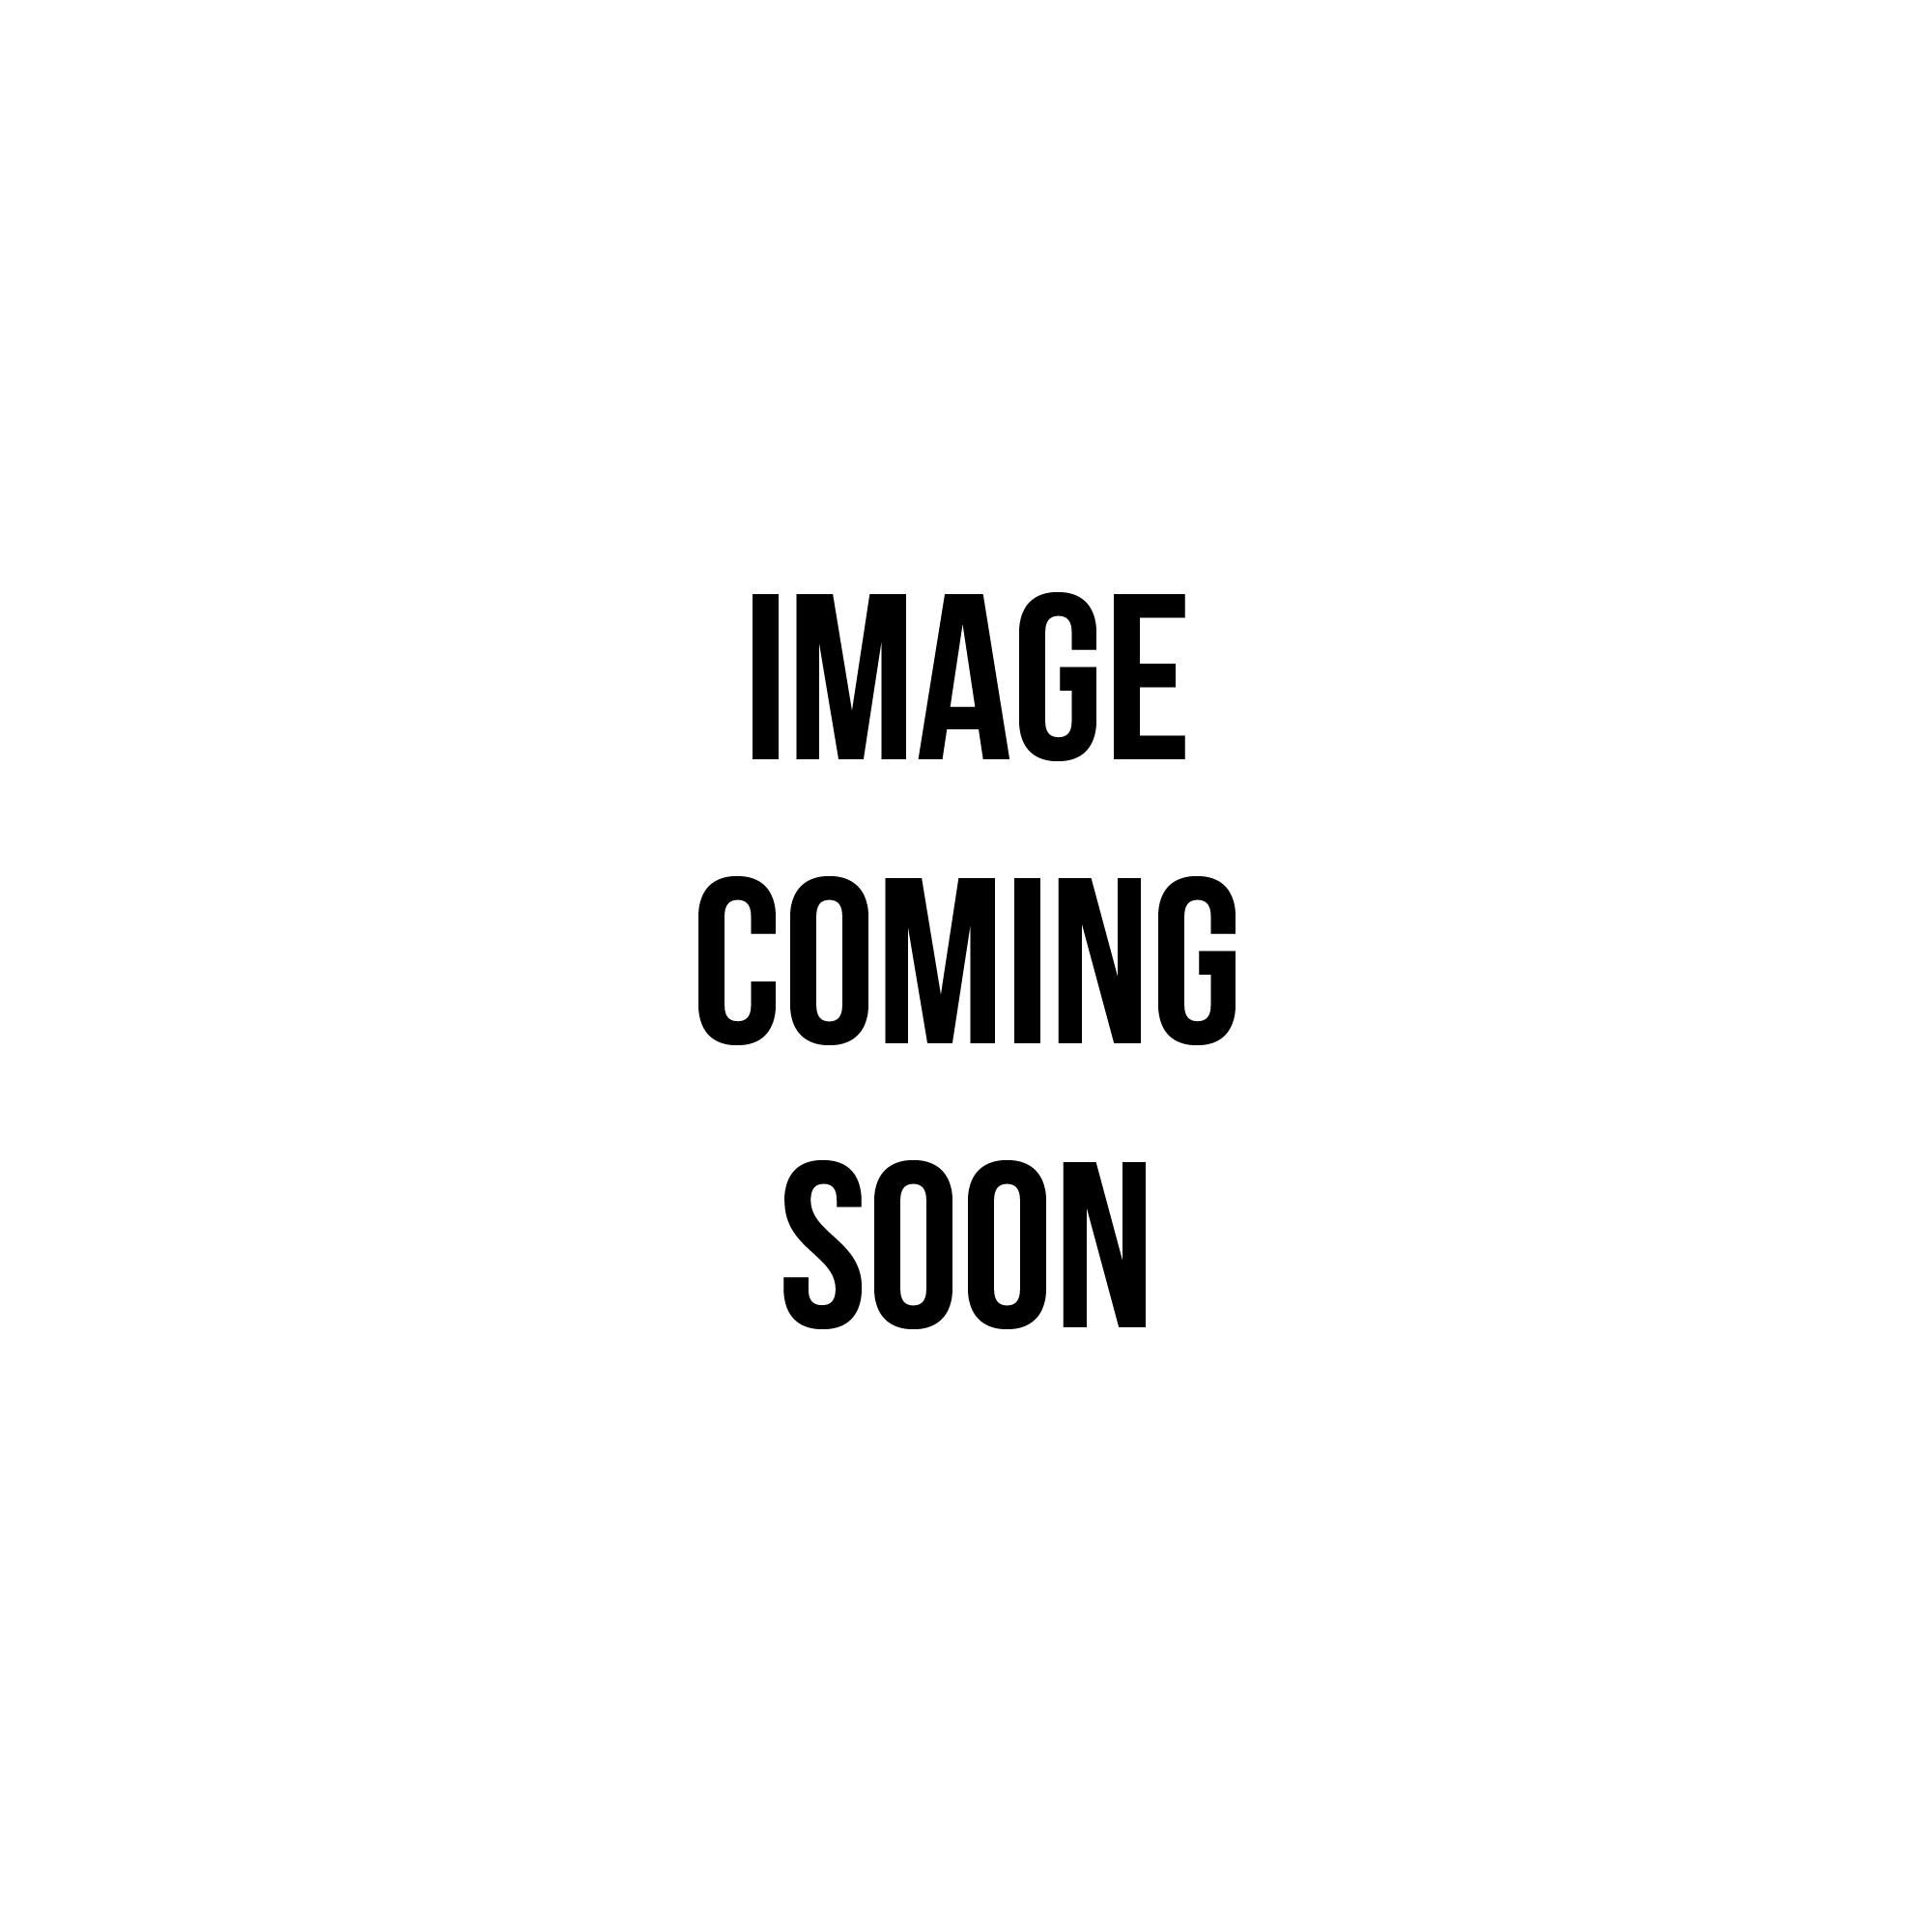 Nike Roshe Une Voile / Fuchsia Force / Cendre Gris Clair / Sombre Ashanti